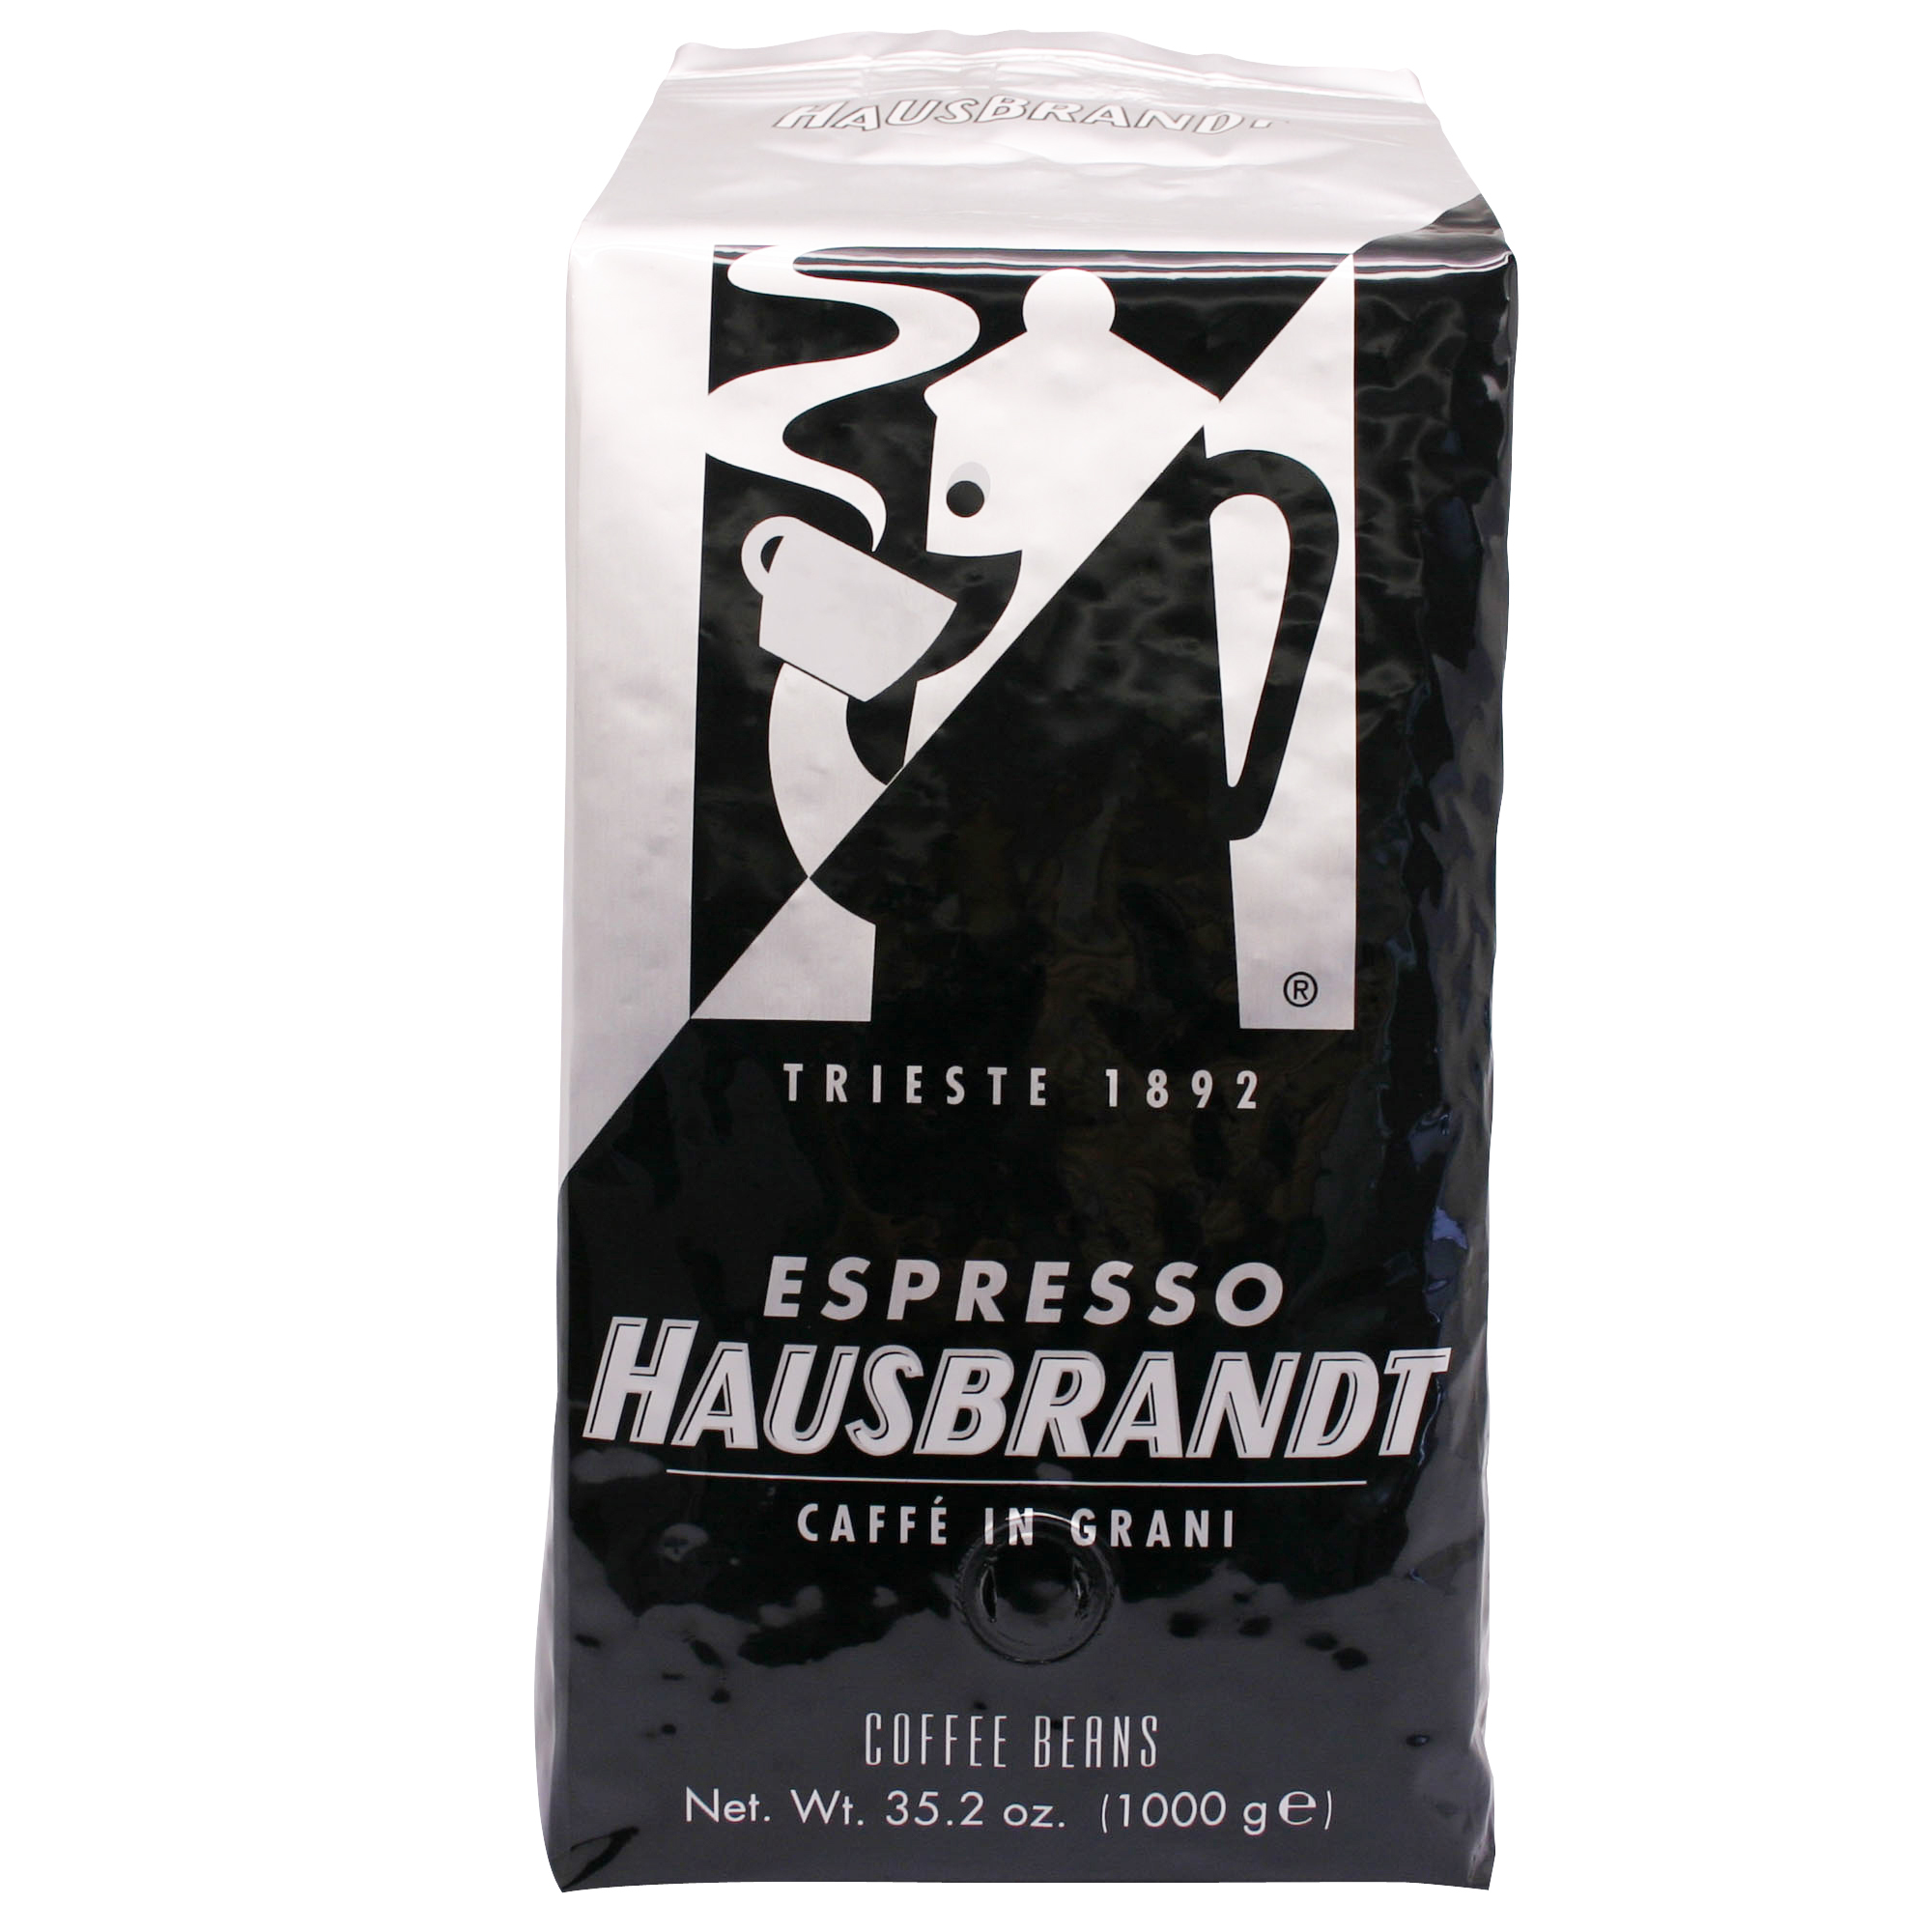 hausbrandt espresso trieste2